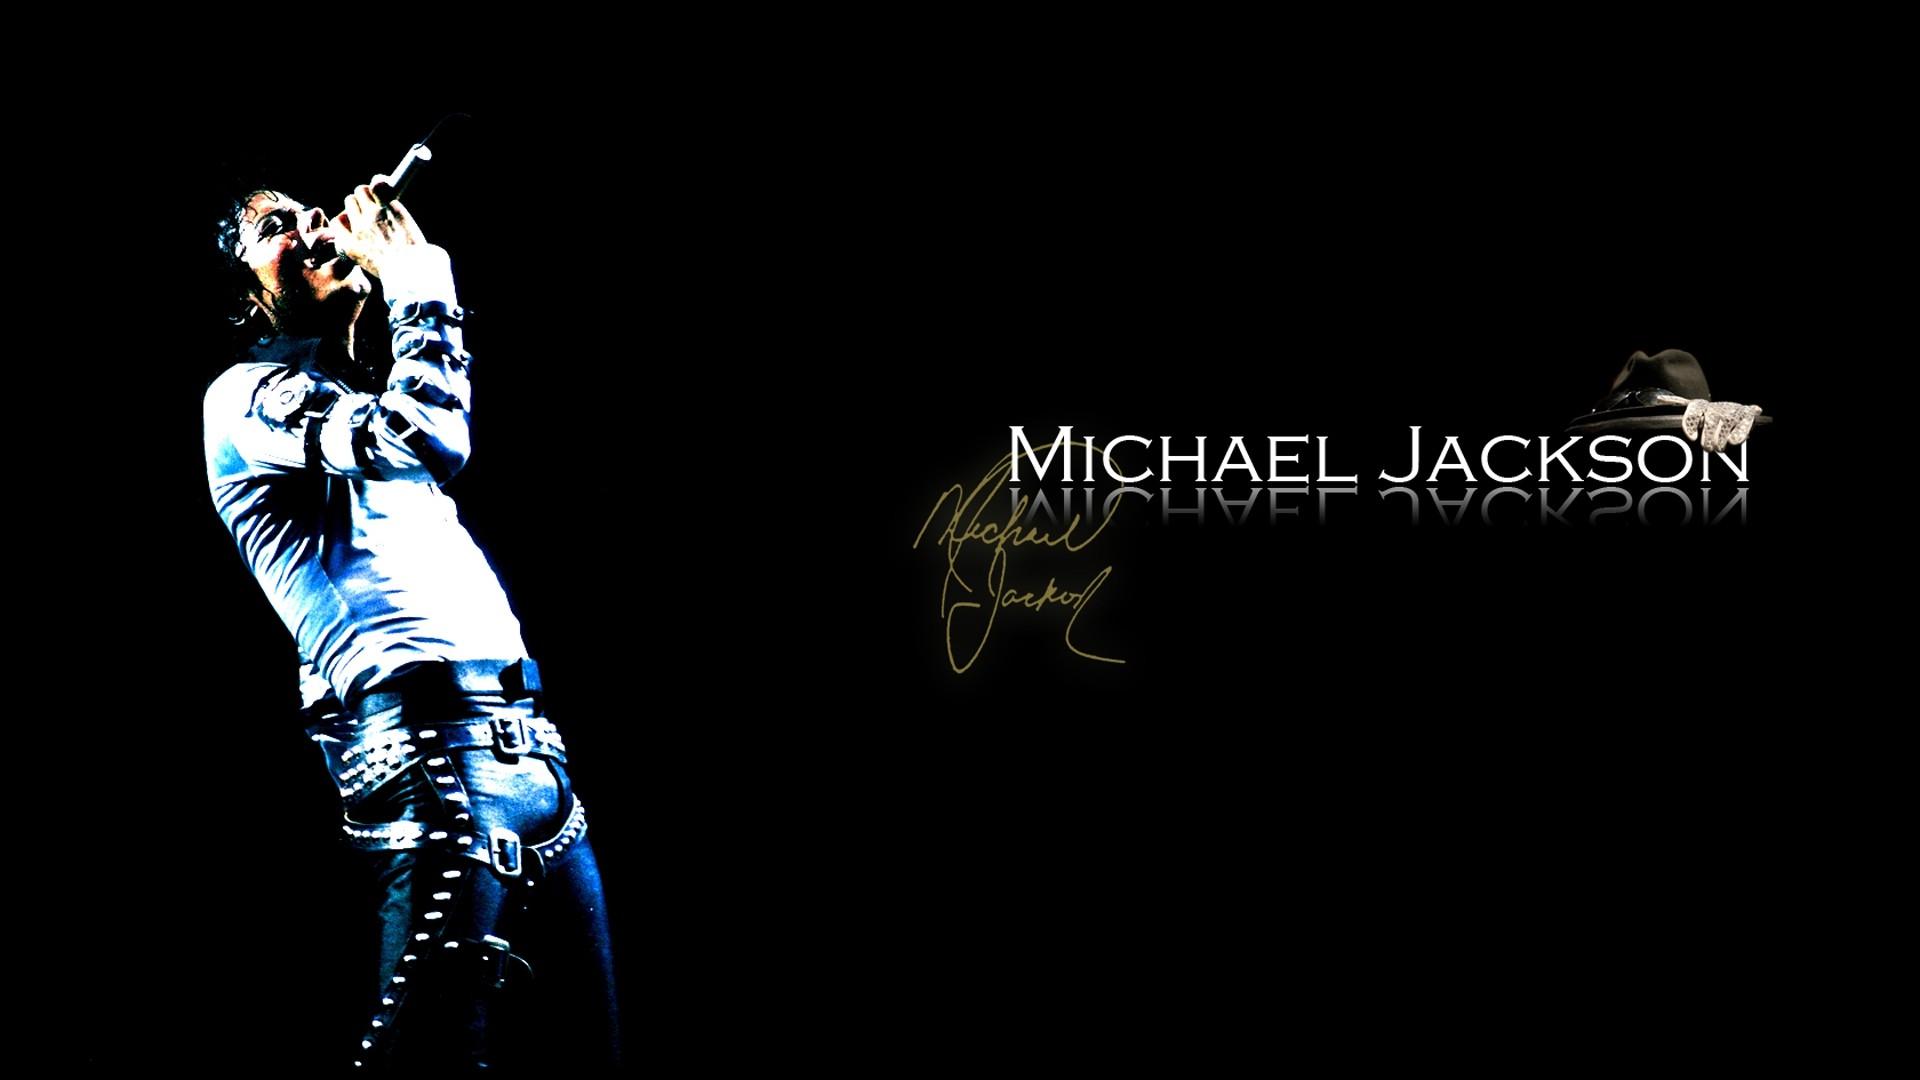 https://2.bp.blogspot.com/-zRk298XWVGM/UE98rDWuFgI. Michael Jackson High  Definition Wallpapers HD